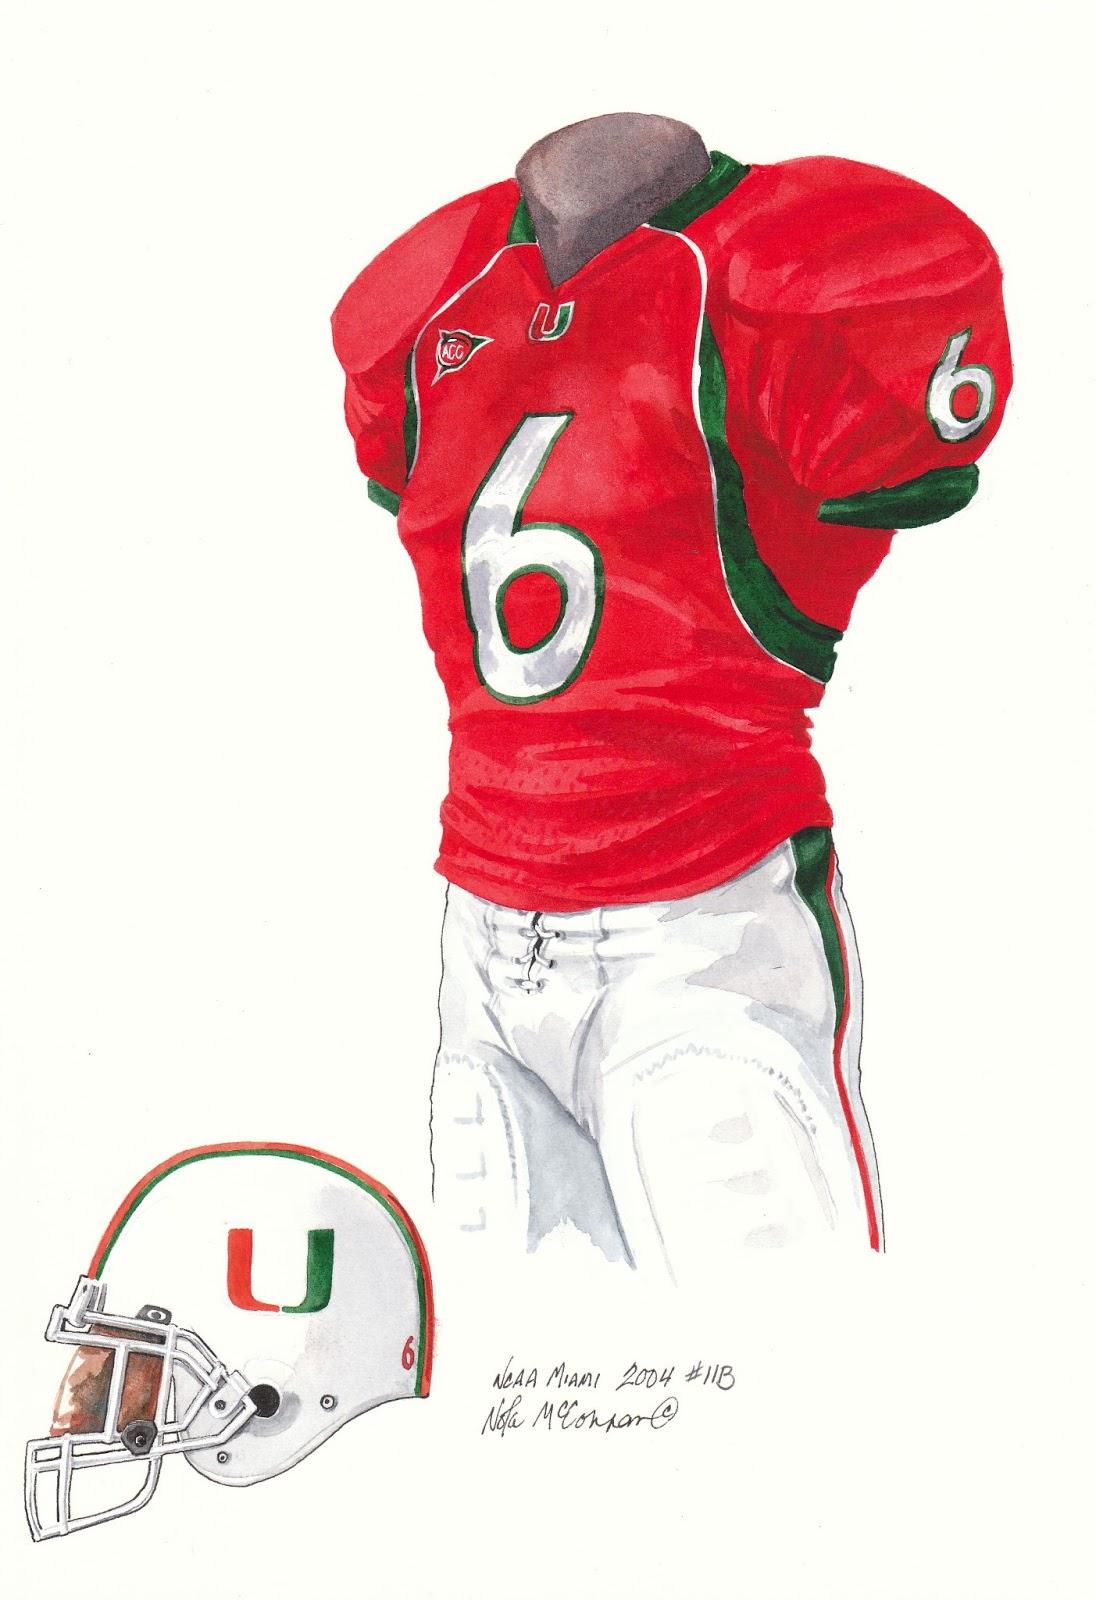 d8e7e96f8 2004 University of Miami Hurricanes football uniform original art for sale